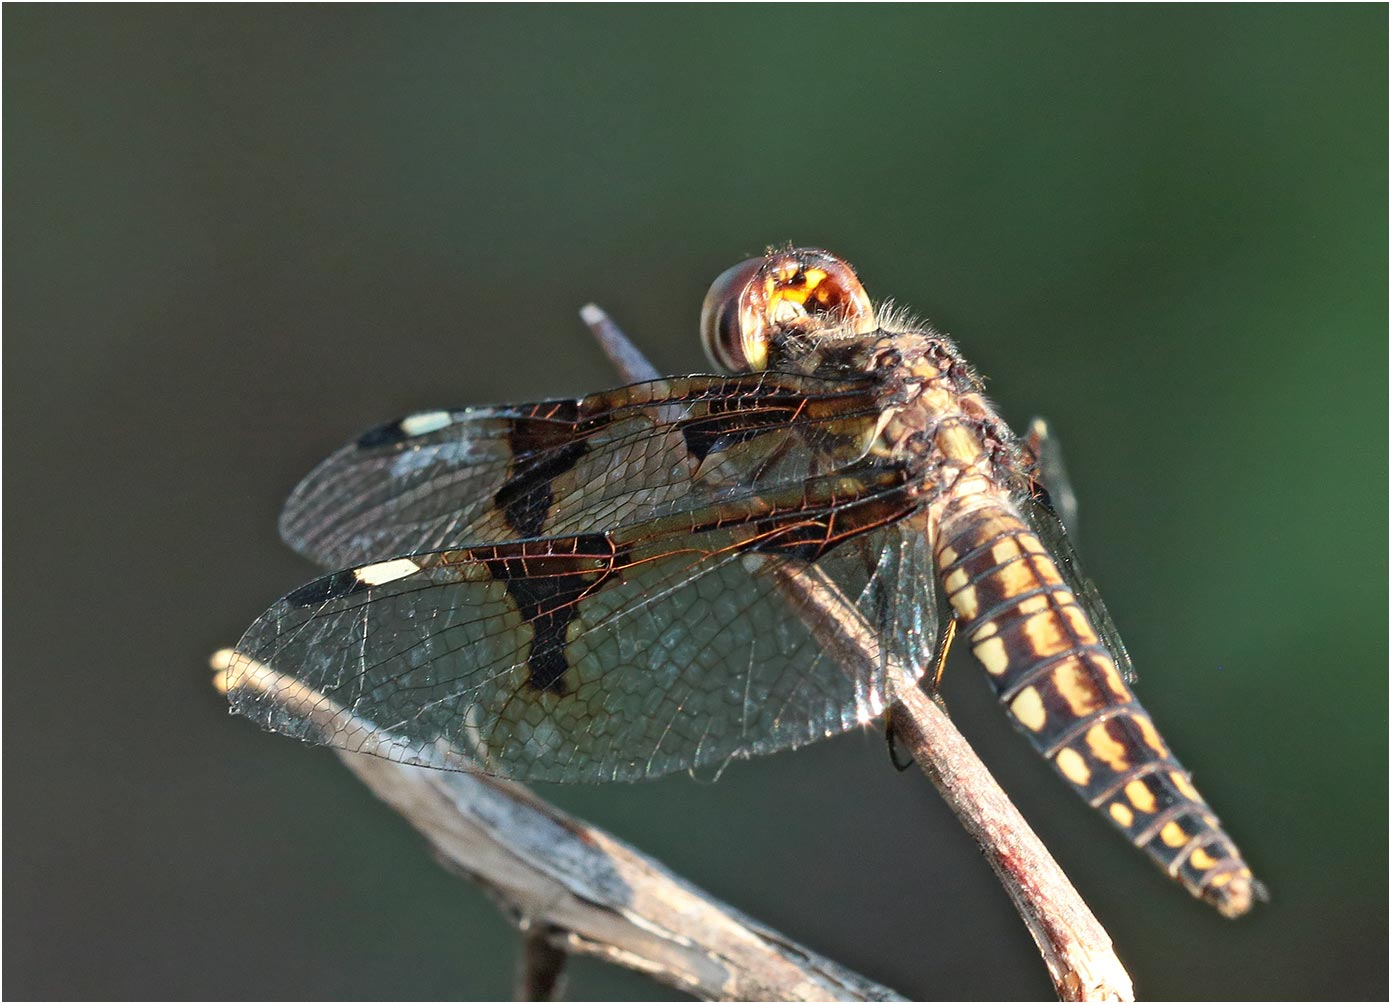 Palpopleura portia femelle, Ethiopie, lac Abaya, 22/10/2018